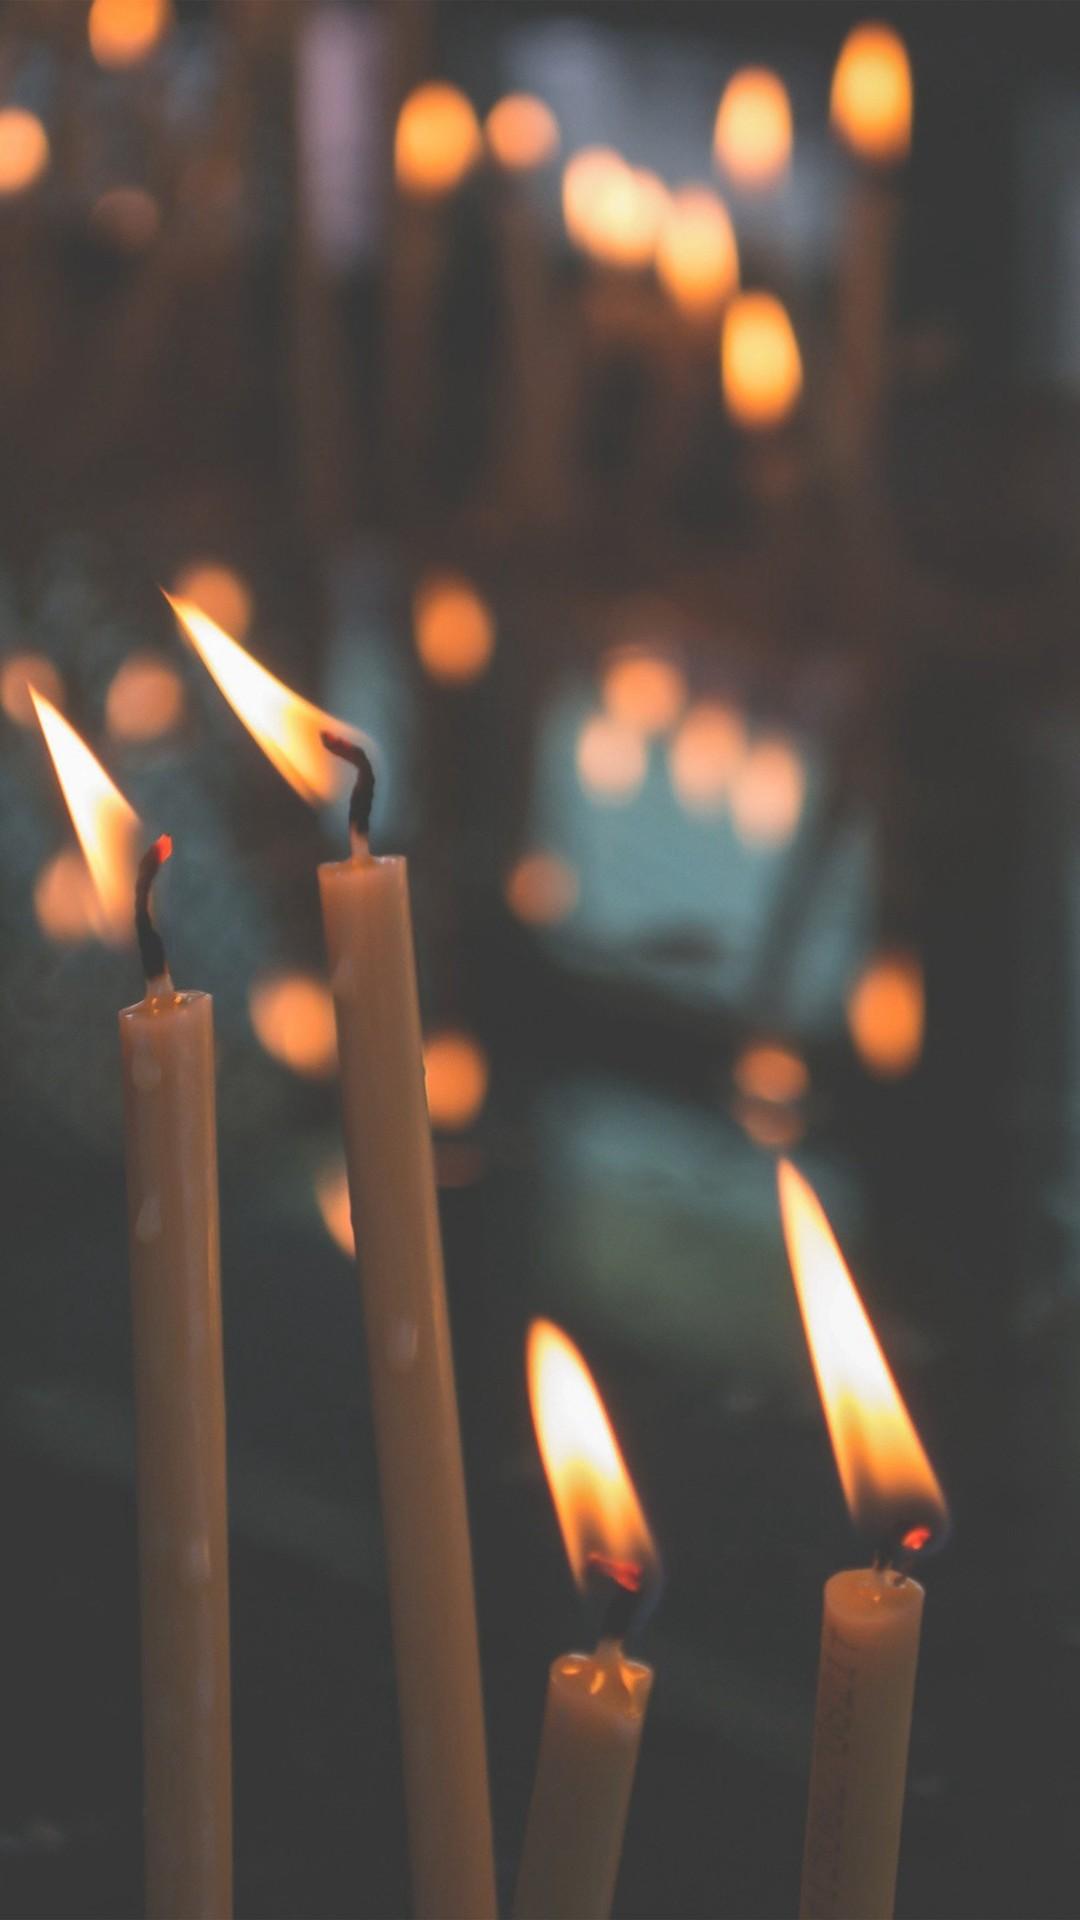 Bokeh Candle Light Nature iPhone 8 wallpaper